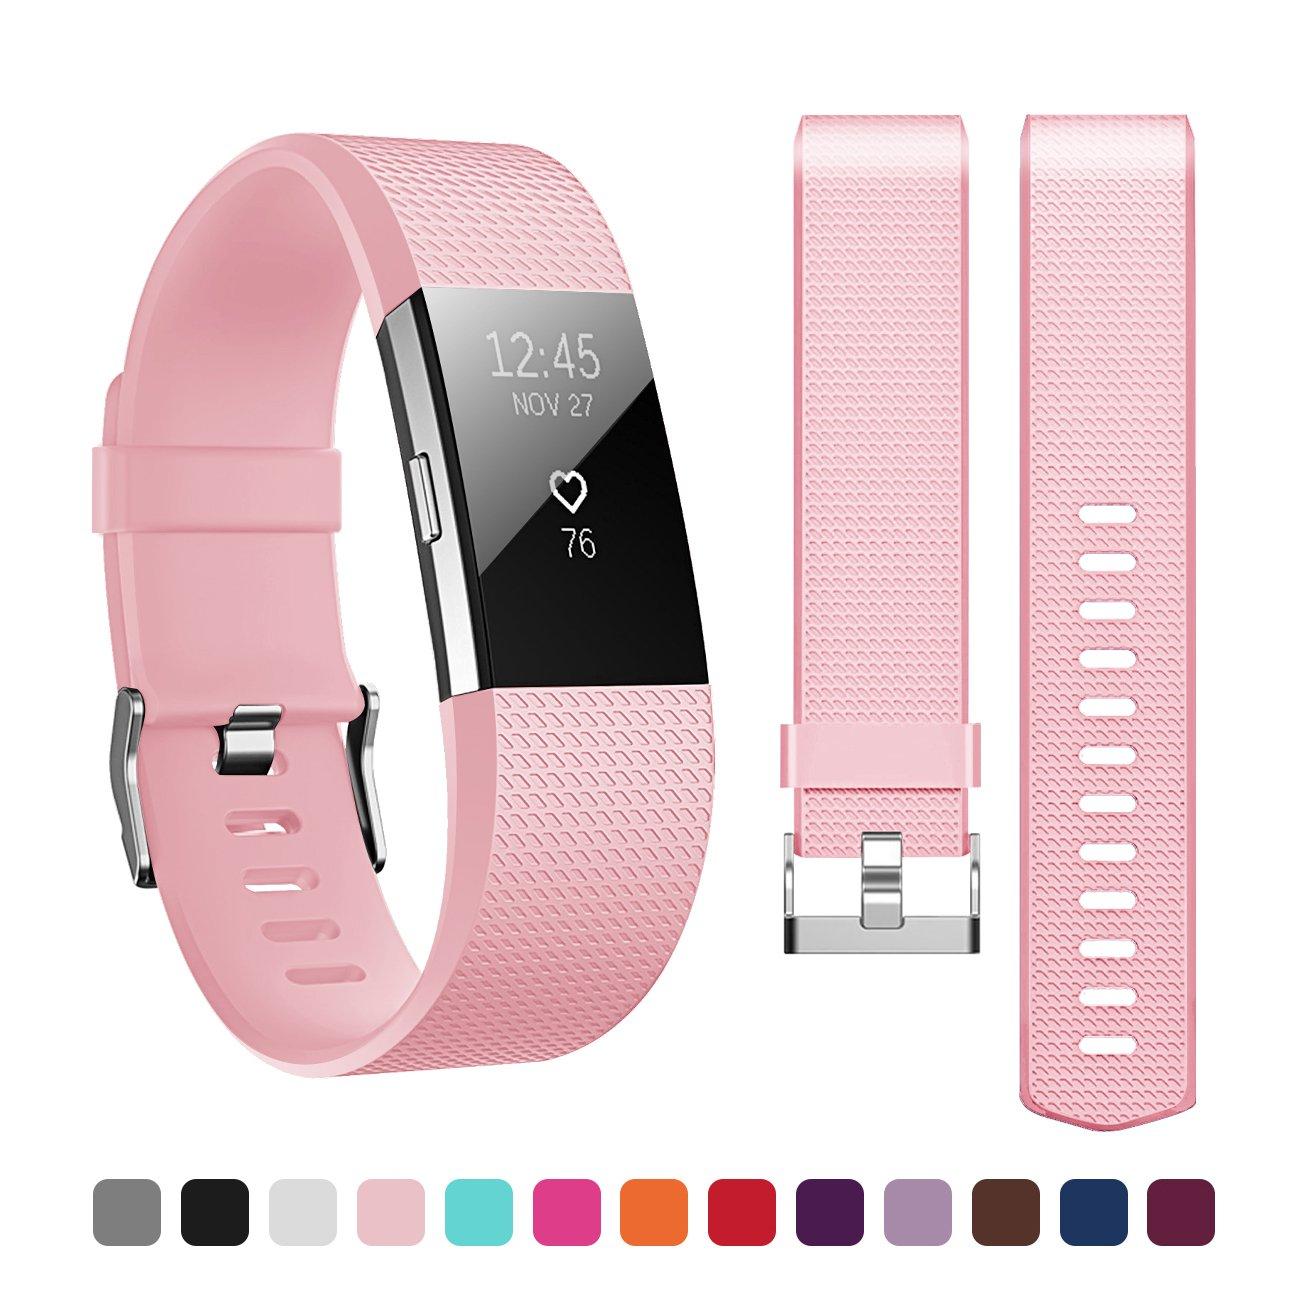 Fitbit Charge 2バンド、maifengソフトTPUシリコン調節可能な交換スポーツストラップバンドfor Fitbit Charge 2 Large(5.6-8.1 in) ピンク B076X62GKJ